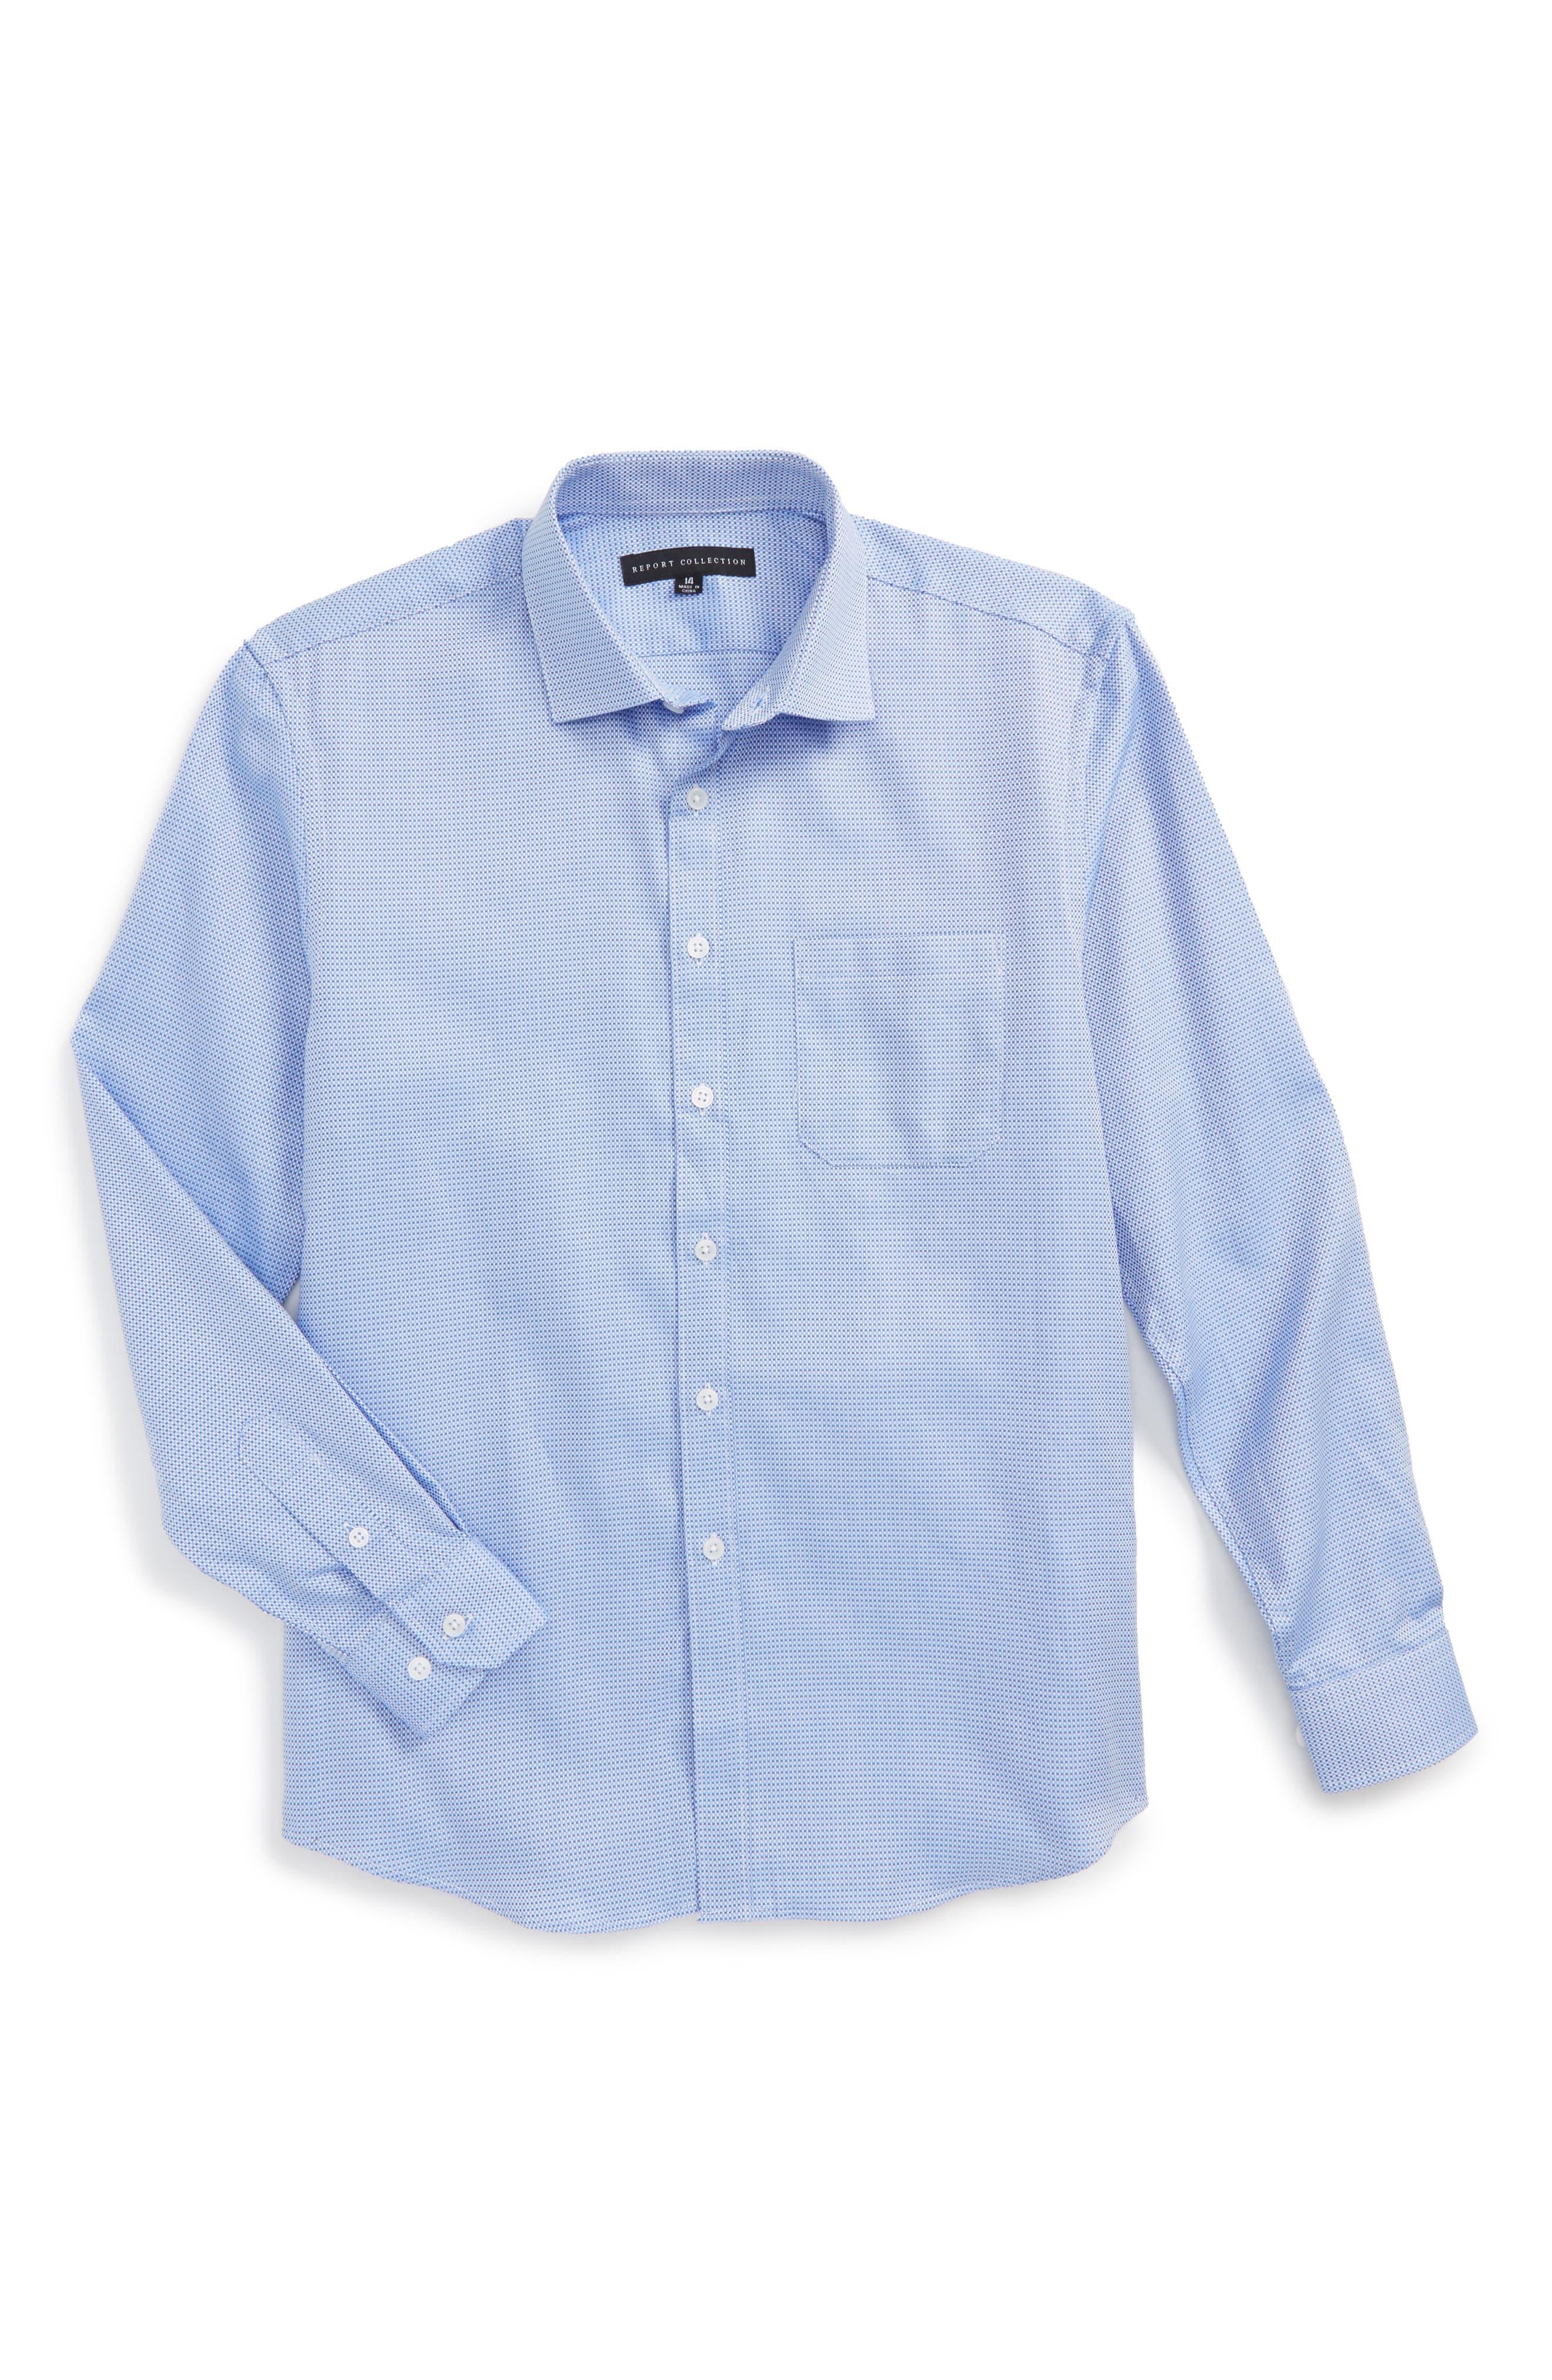 Textured Dress Shirt,                         Main,                         color, Royal